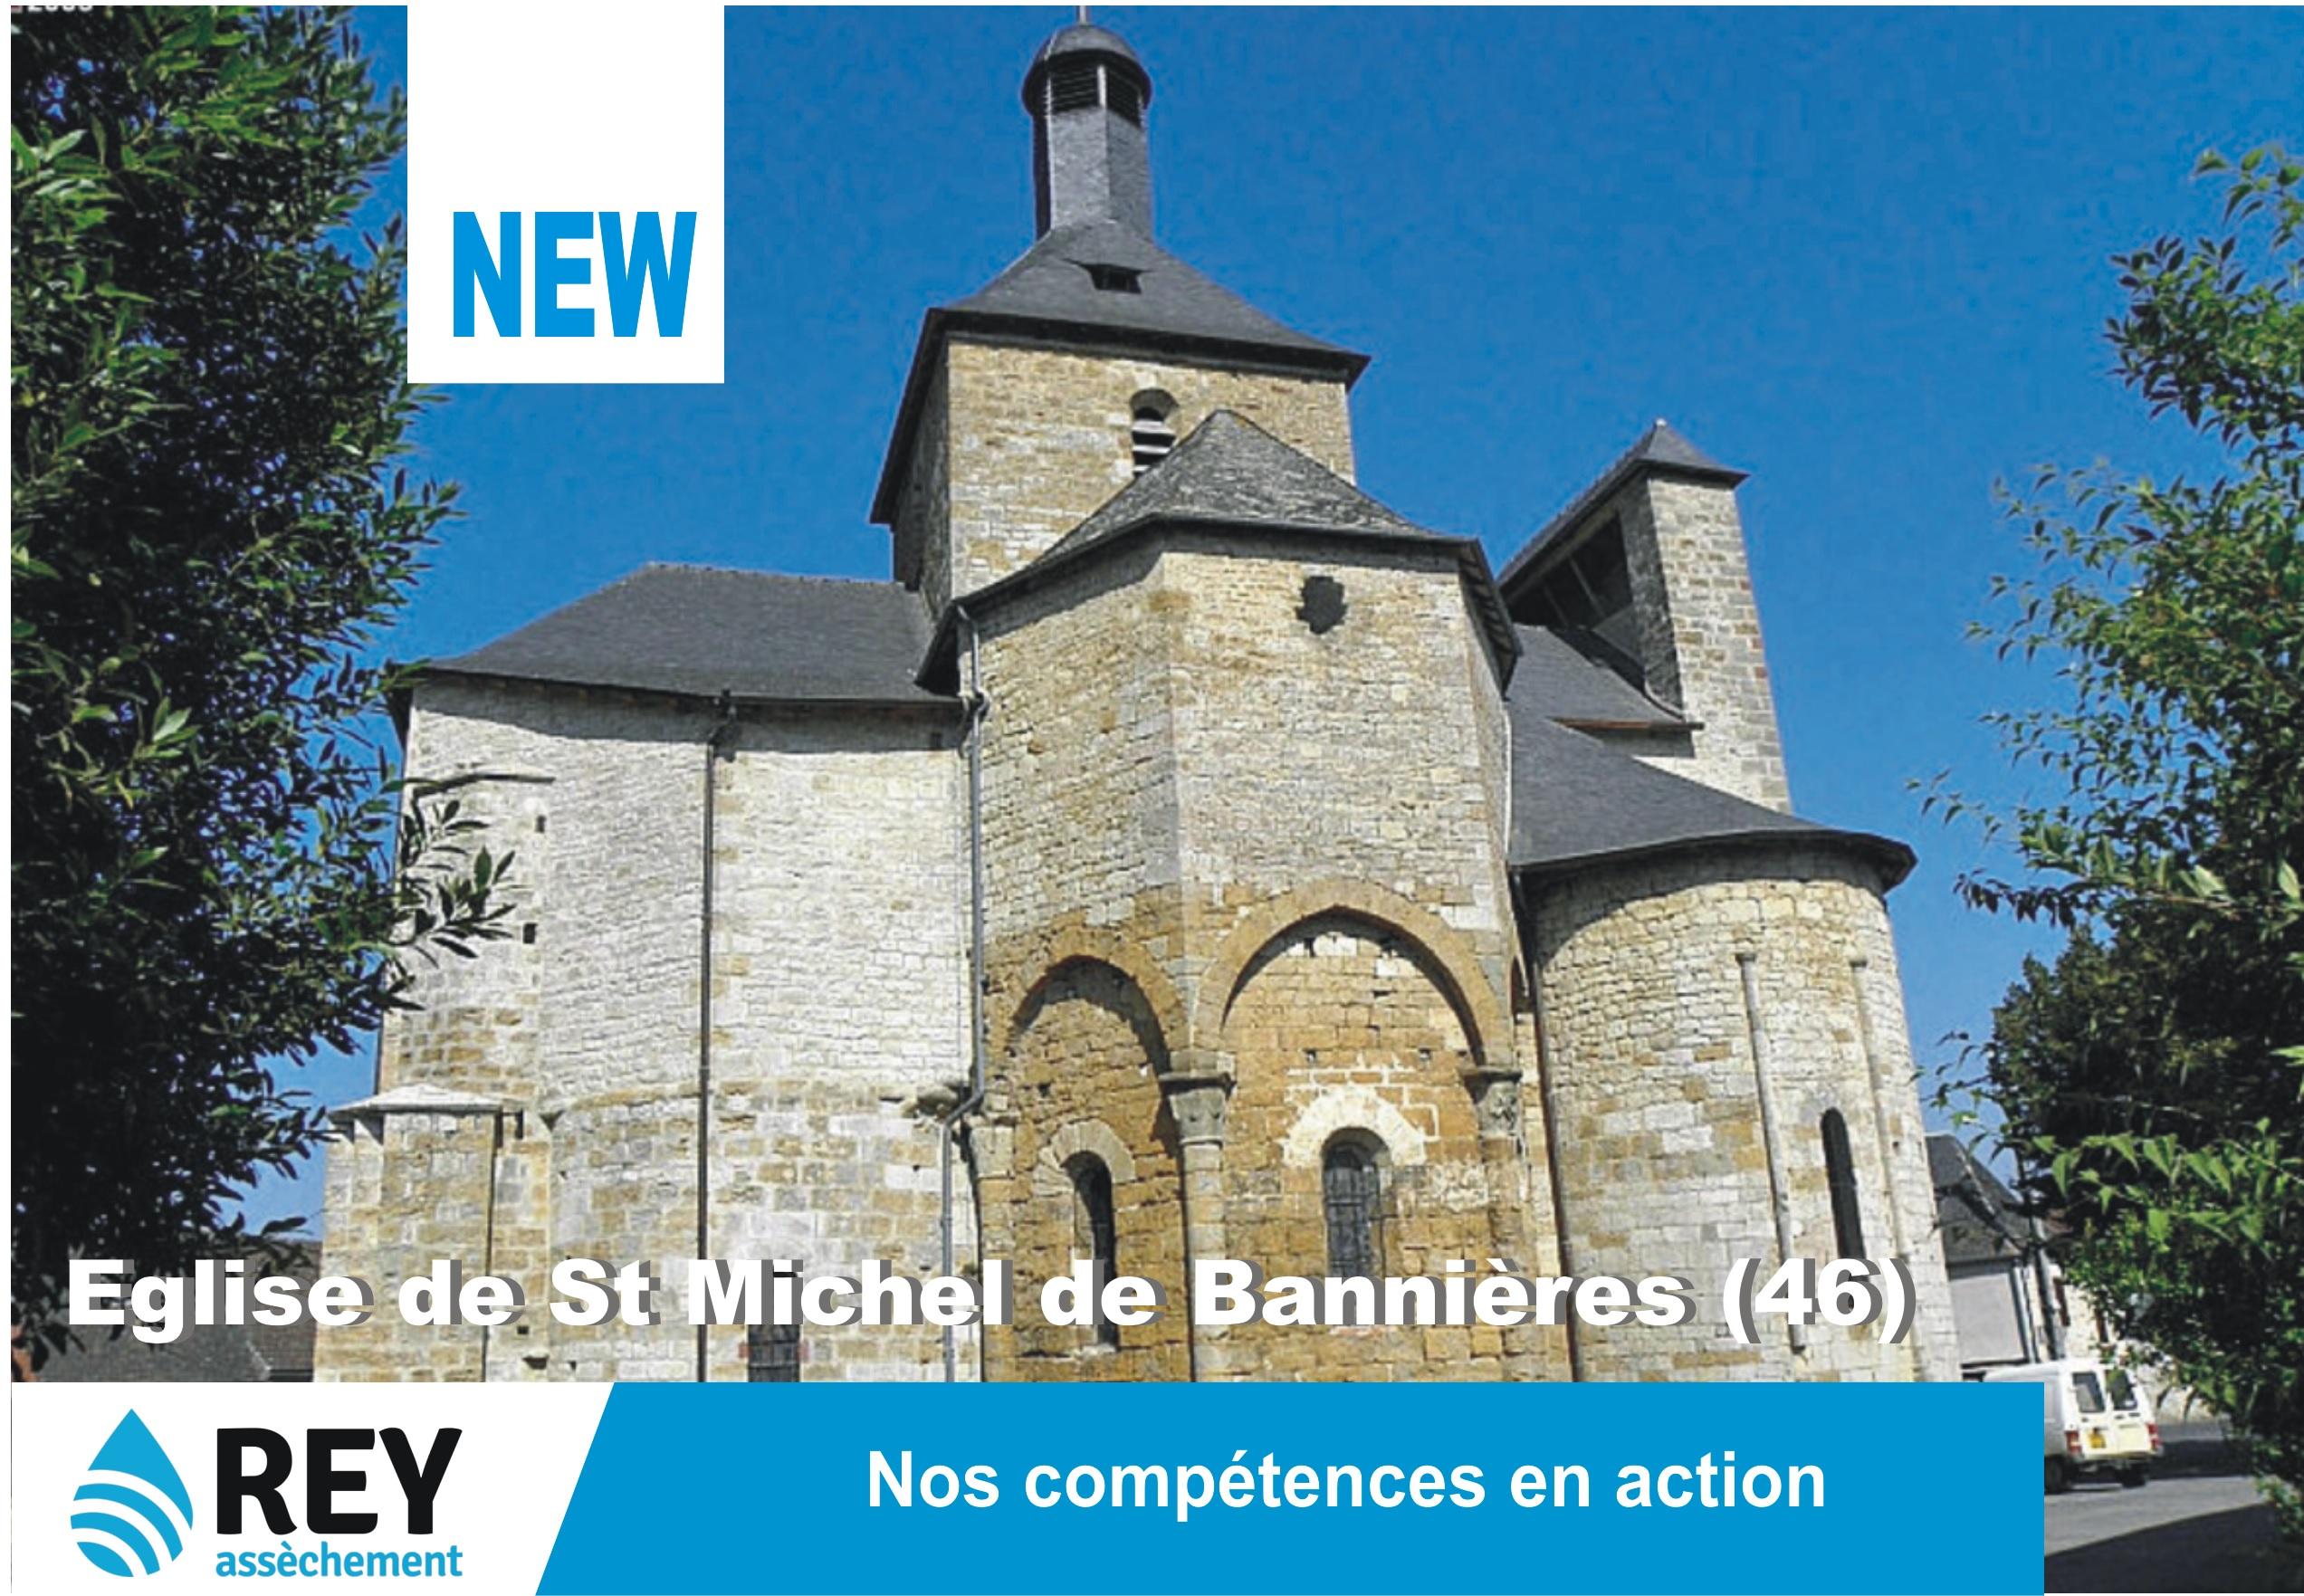 ST MICHEL DE BANNIERES